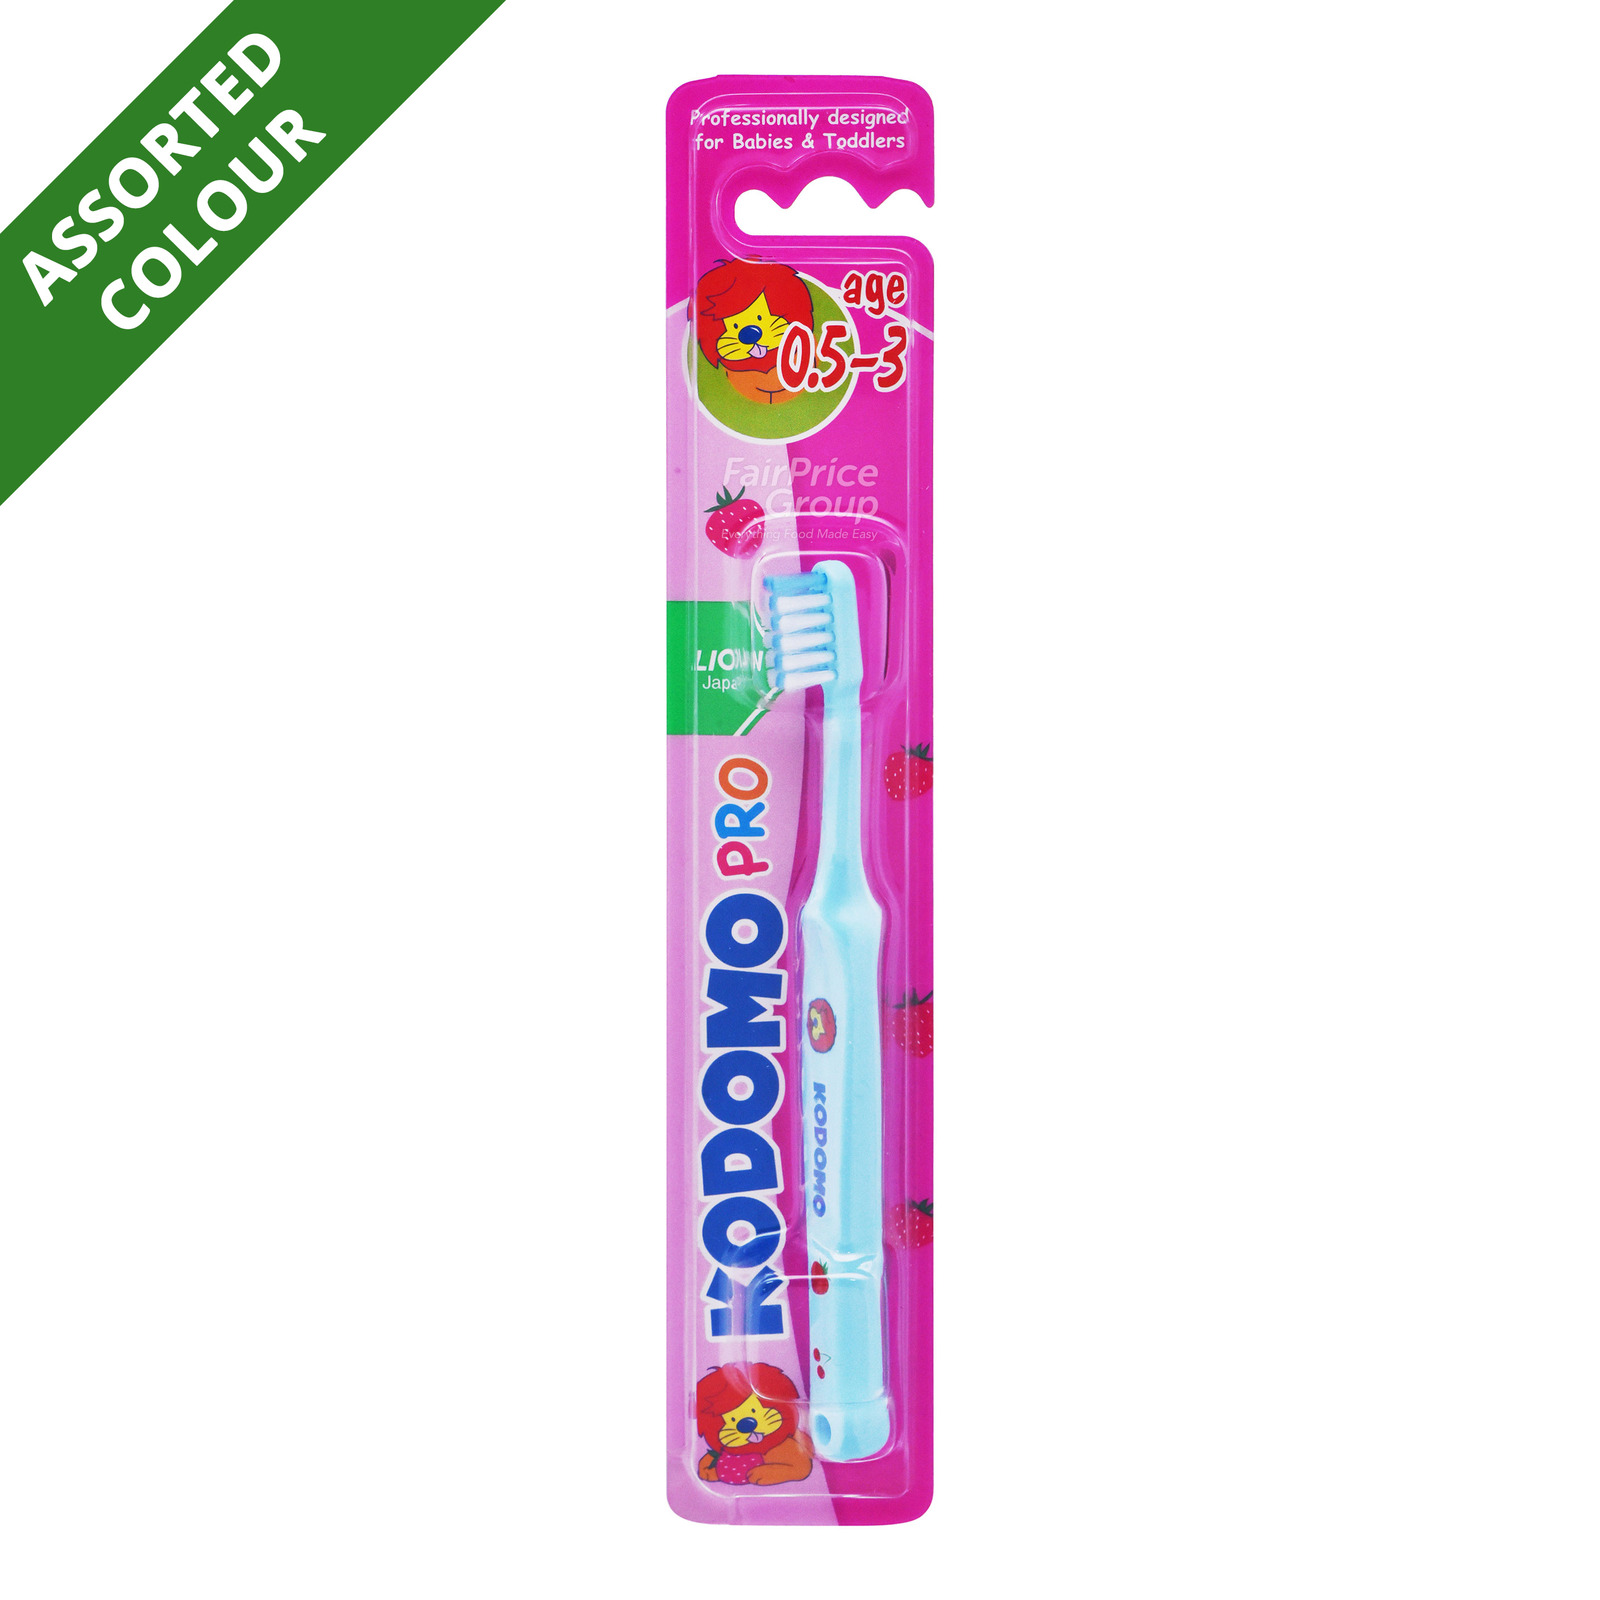 Kodomo Children Toothbrush - Pro (0.5 - 3 years old)